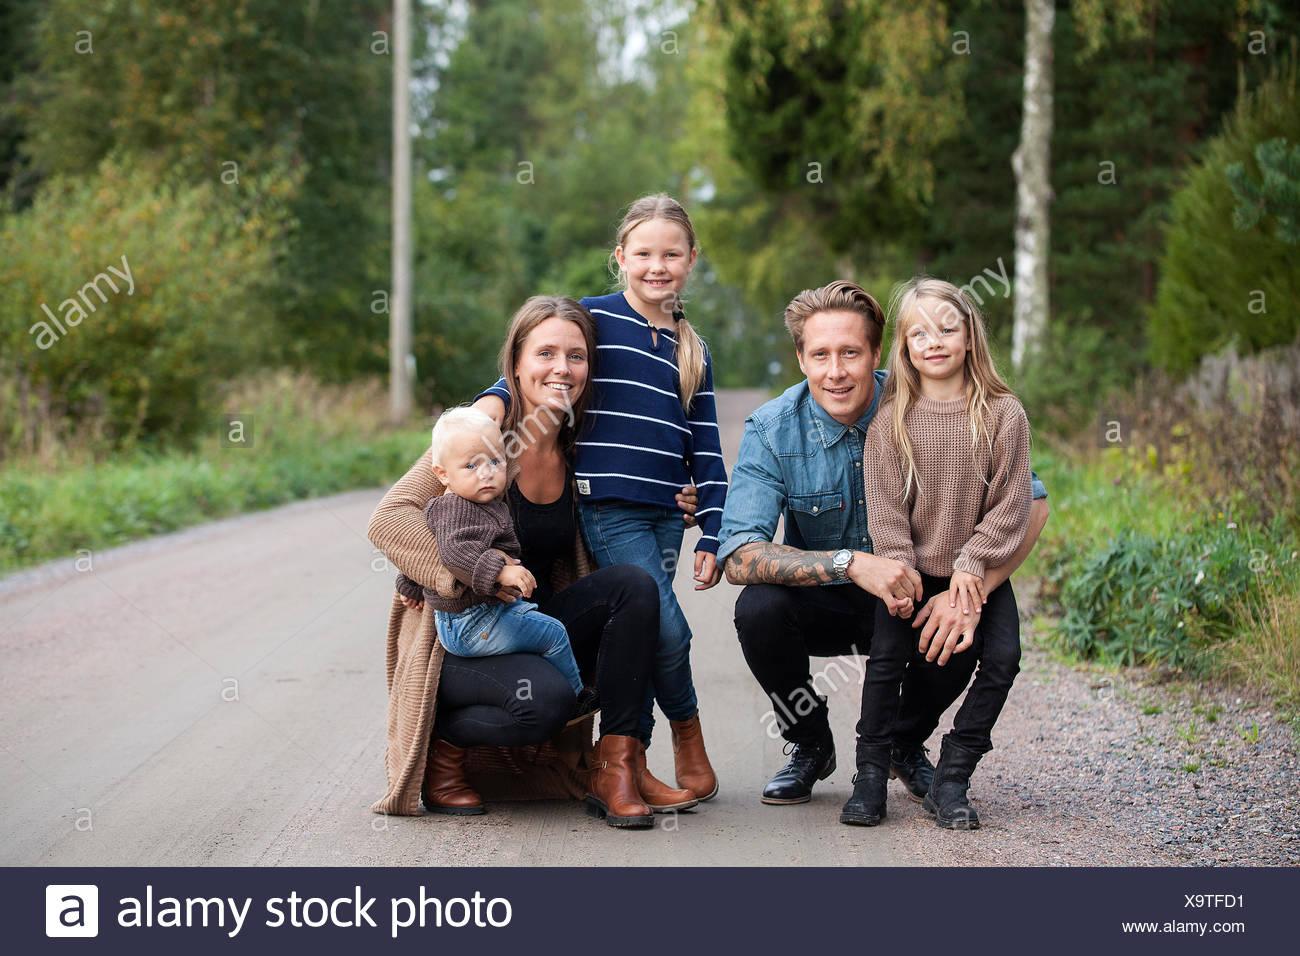 Finland, Uusimaa, Raasepori, Karjaa, Portrait of family with three children (12-17 months, 6-7) - Stock Image